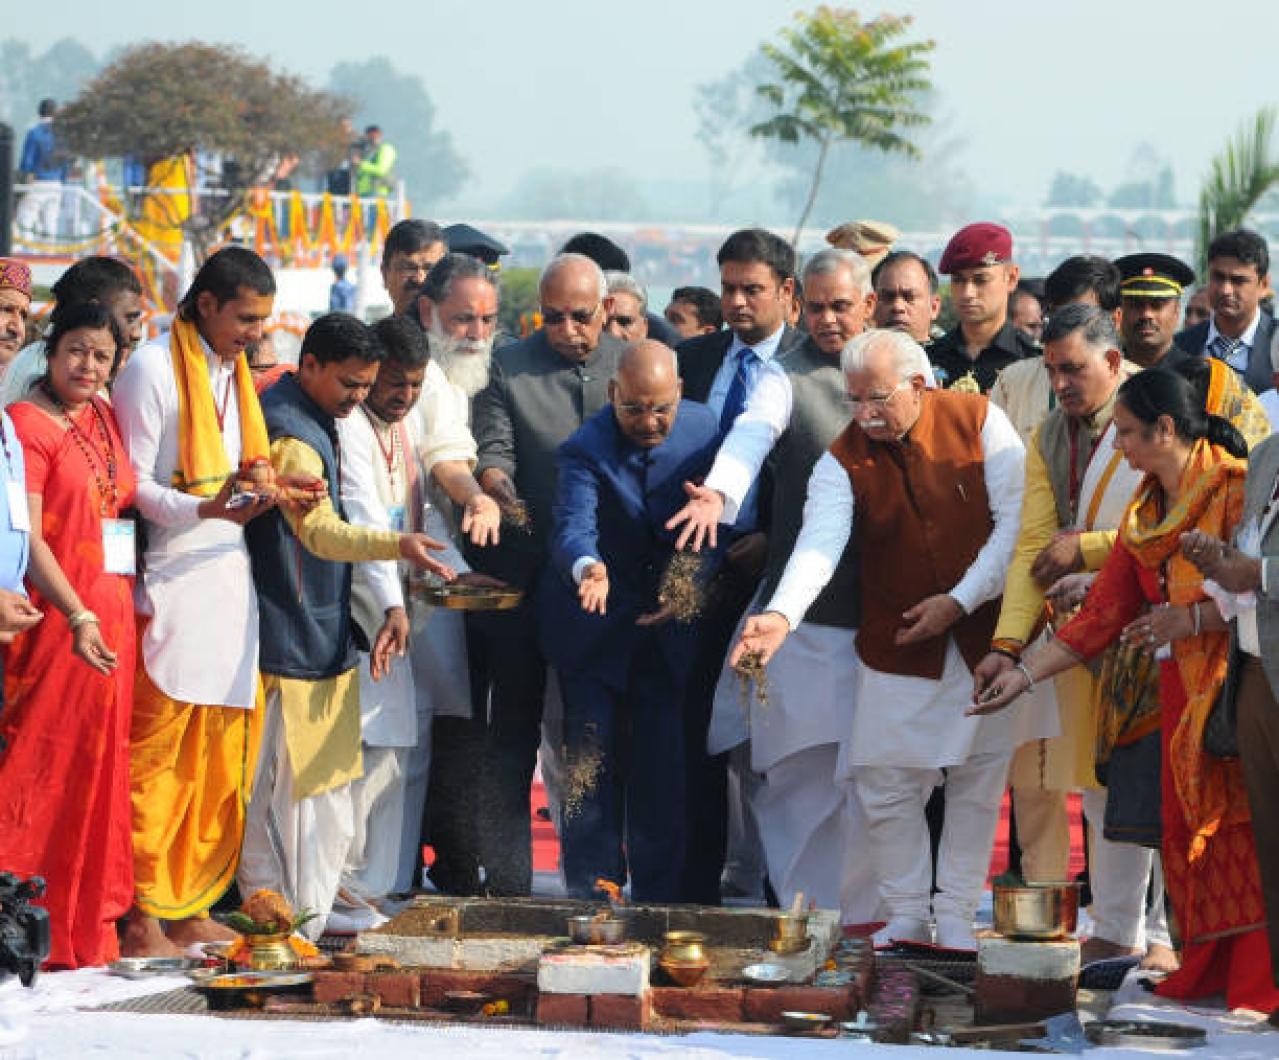 President Ram Nath Kovind, centre, with Governor Haryana Kaptan Singh Solanki, Chief Minister Manohar Lal Khattar and Himachal Pradesh Governor Acharya Dev Vrat during Gita Mahotsav 2017.